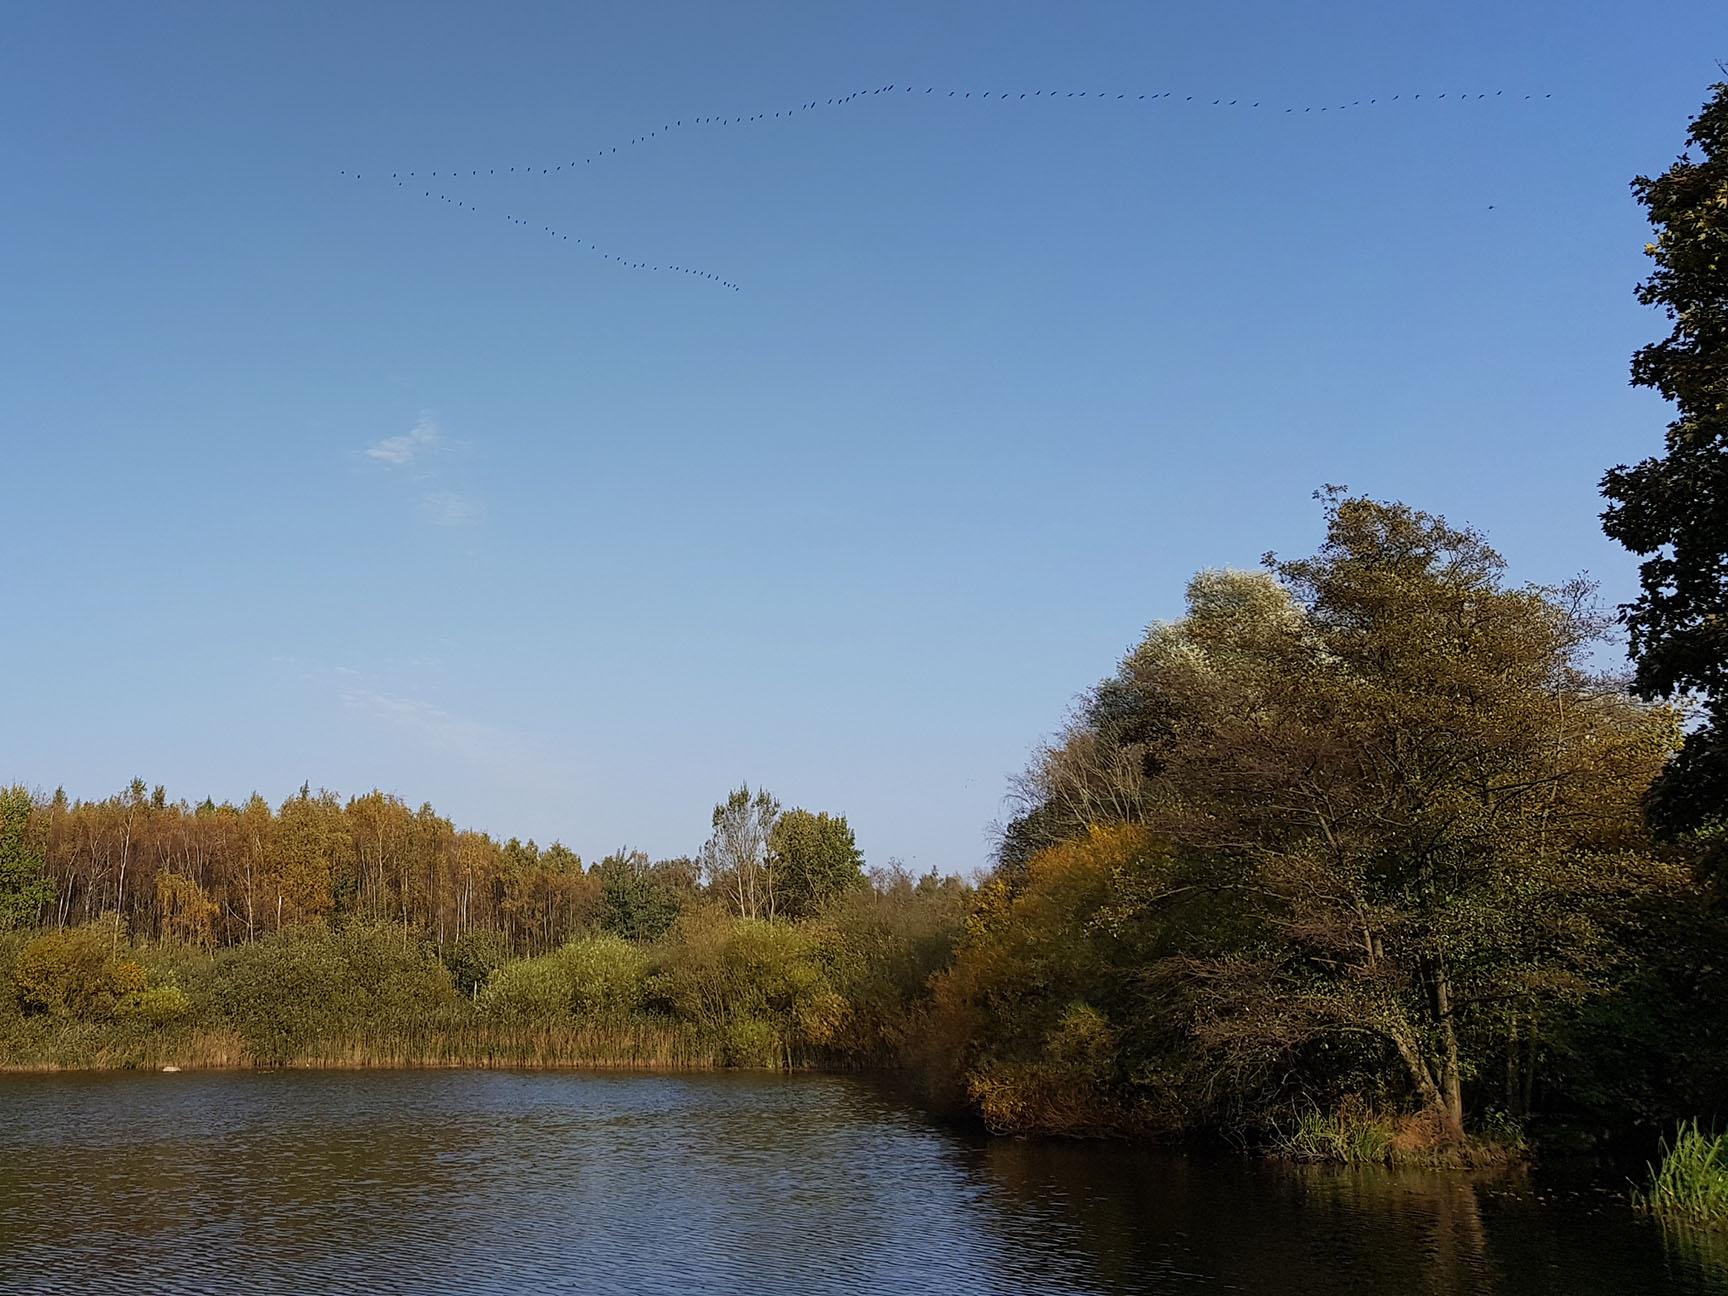 #Landlust, #Natur, #Gänseflug, Naturschutzgebiet